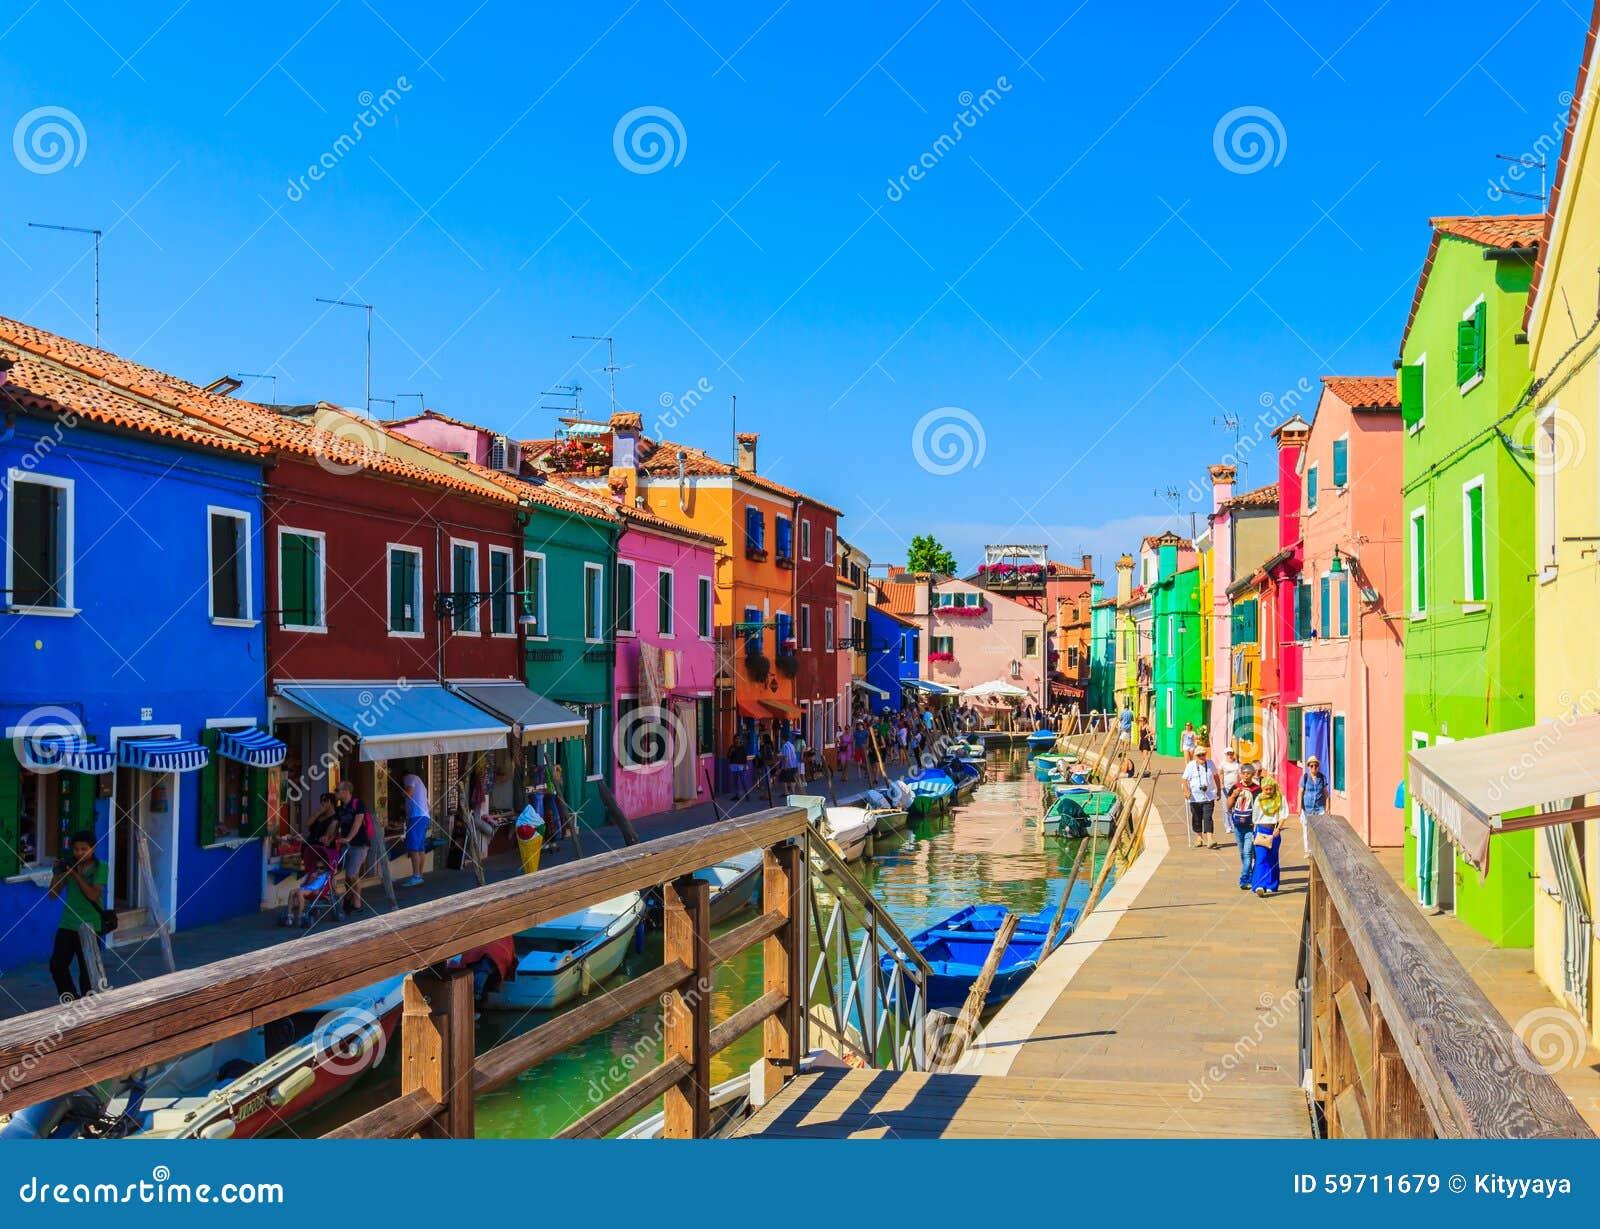 Colorful burano italy burano tourism - Colourful Buildings On Burano Island Editorial Stock Image